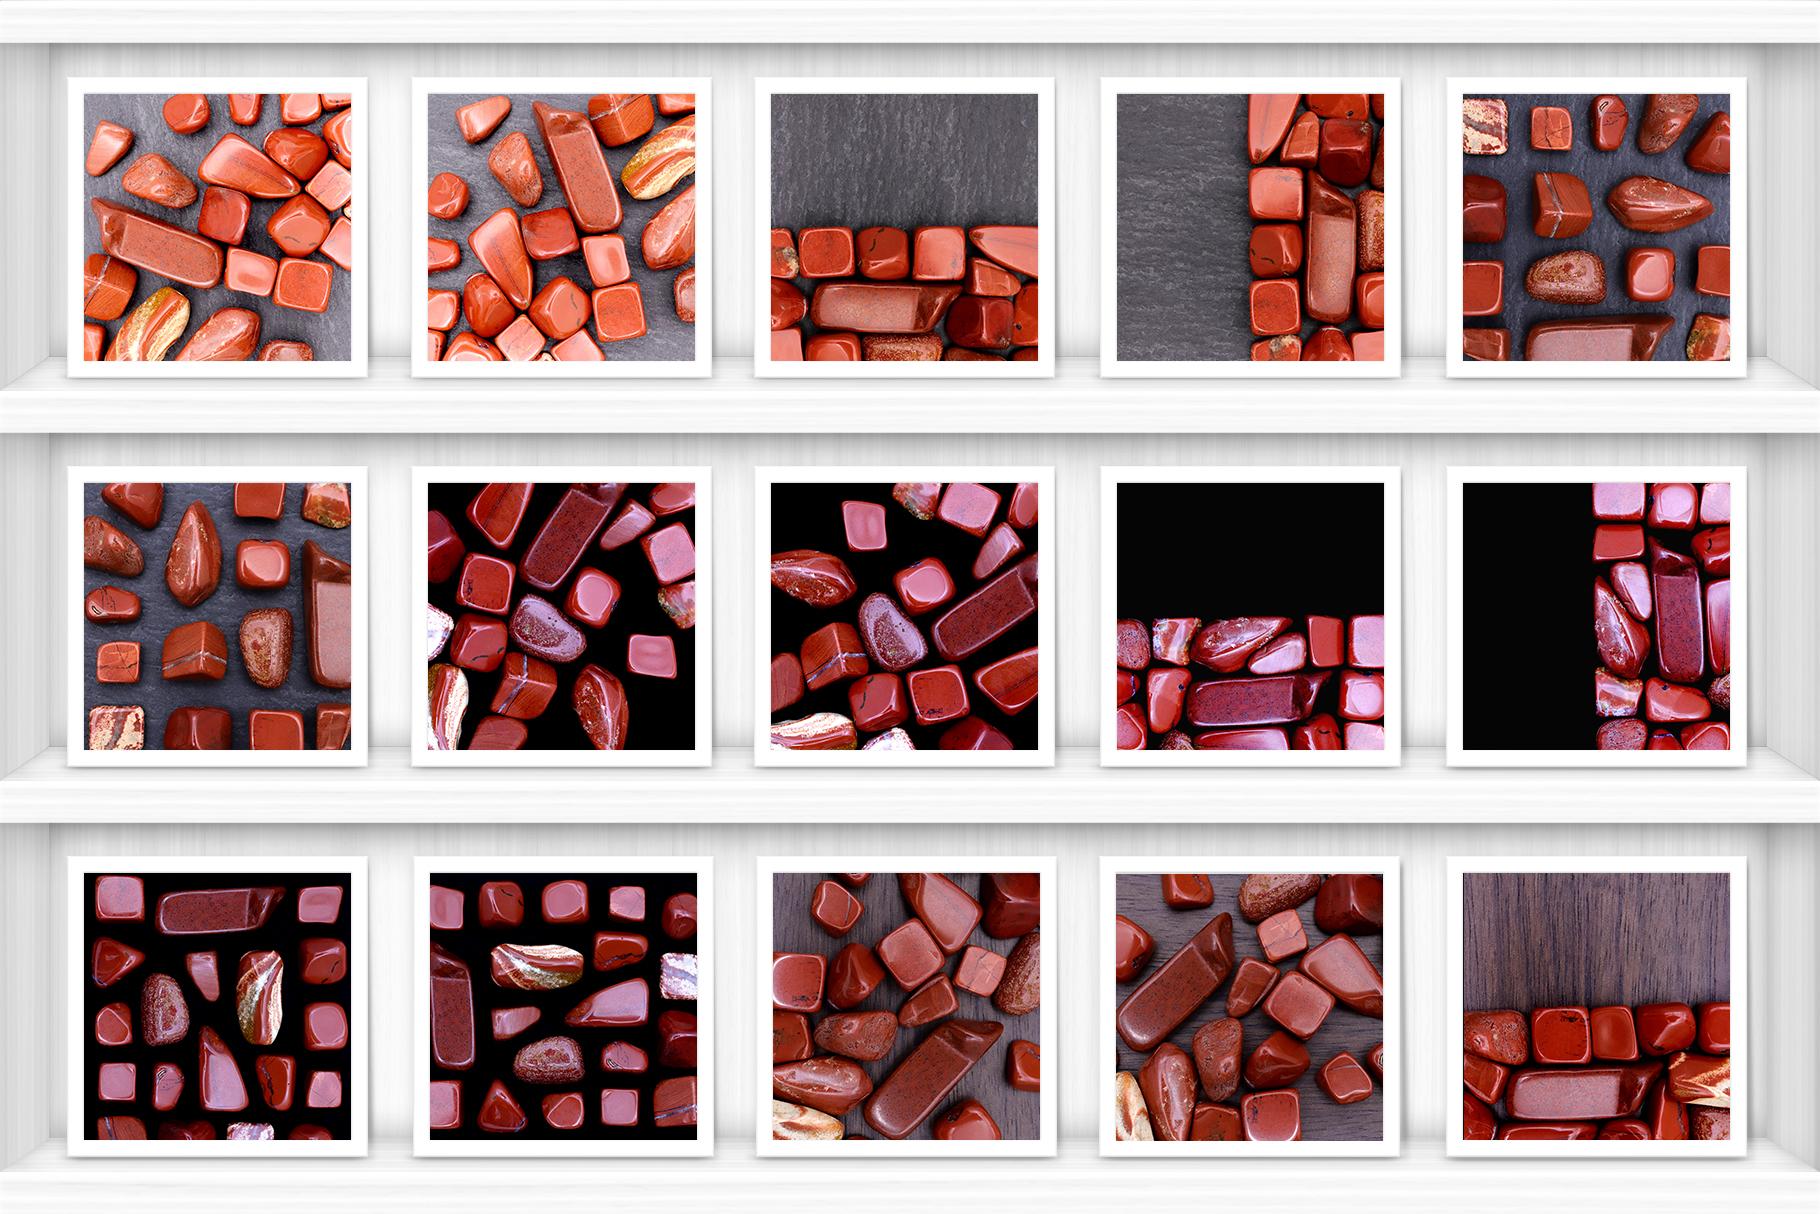 Red Jasper Background Textures Showcase Shelves Samples Preview